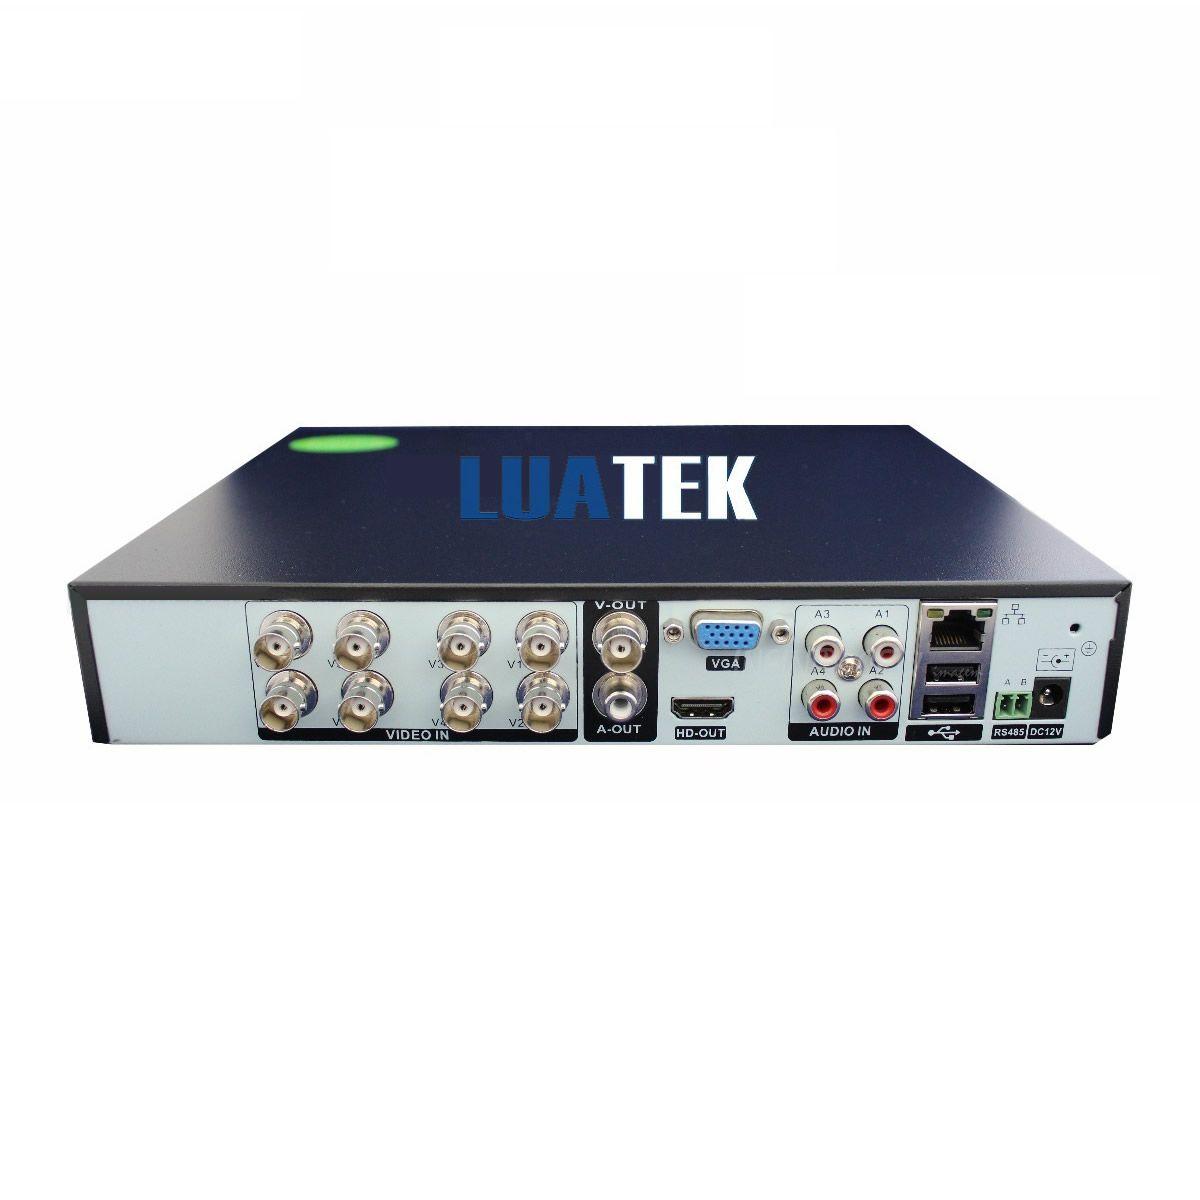 KIT 4 CÂMERAS DE SEGURANÇA BULLET HD 720P + DVR + CABOS LUATEK LKK-208